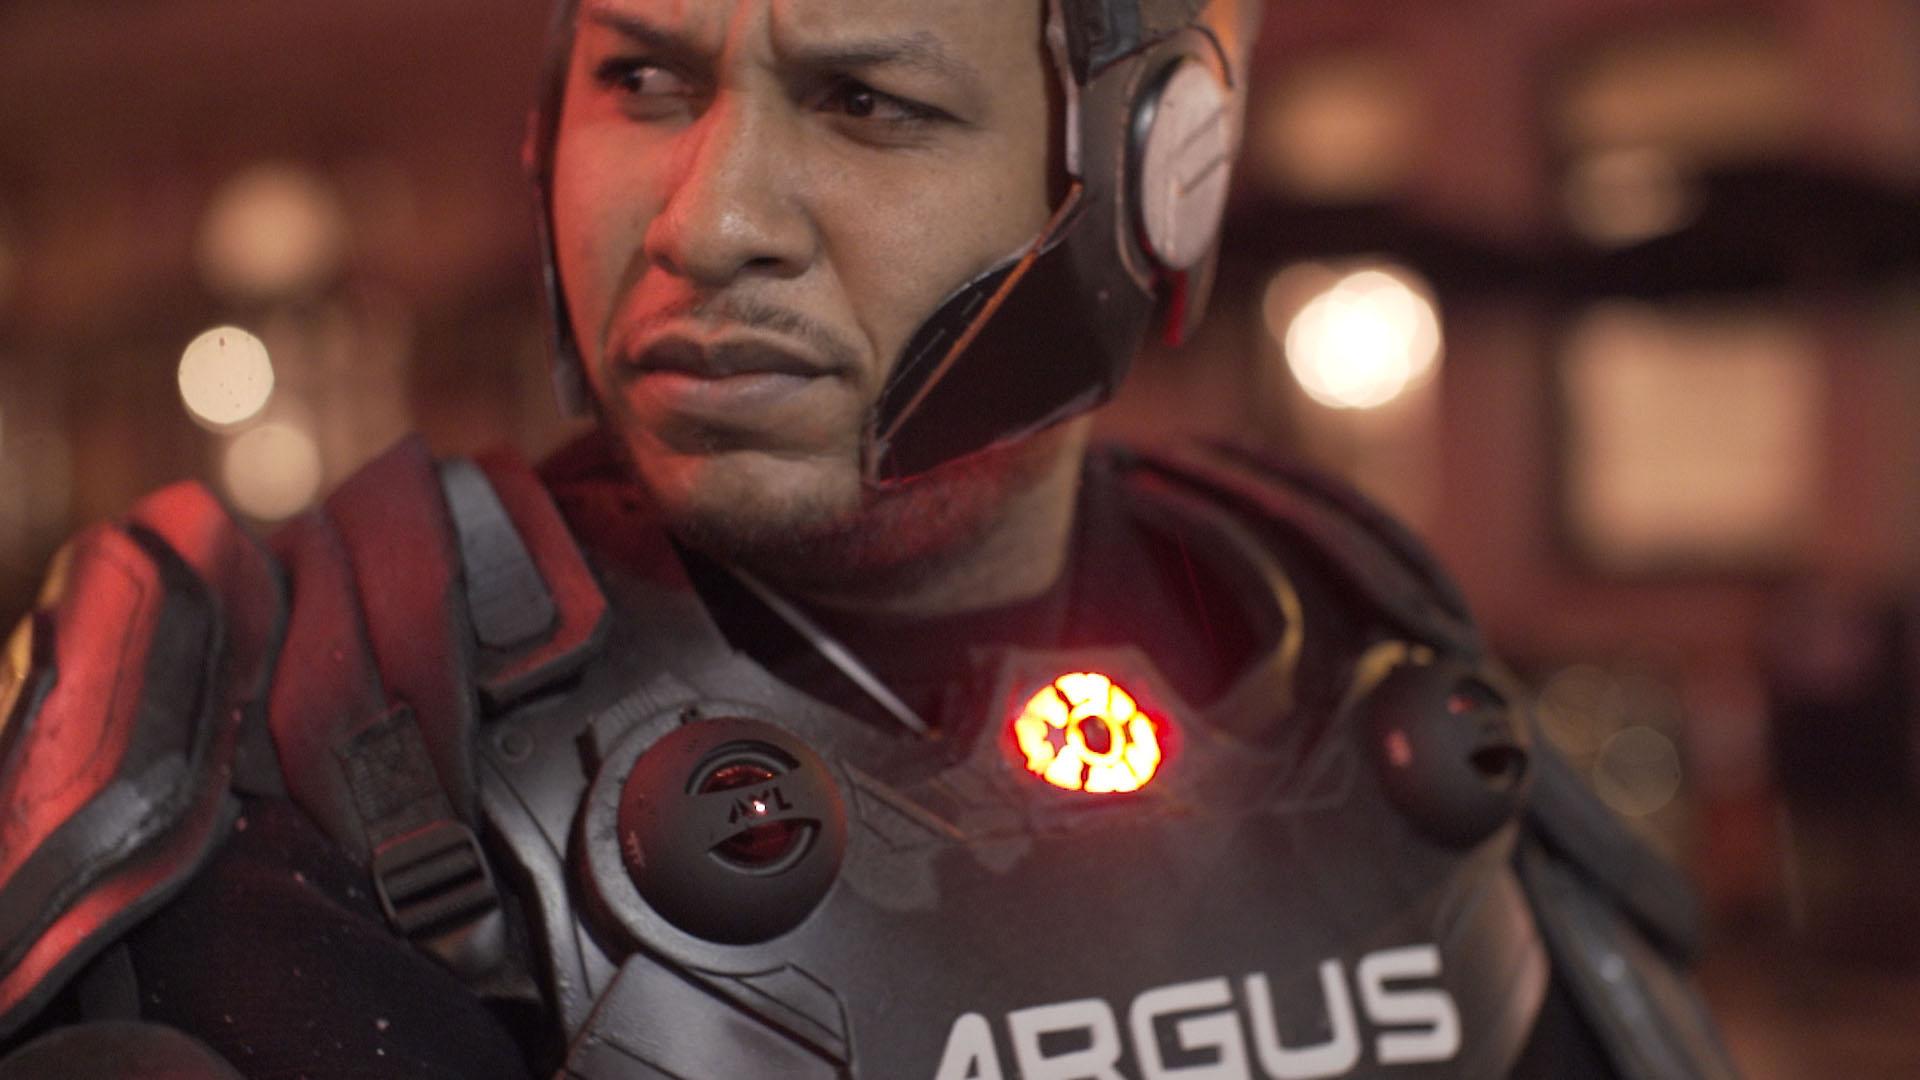 The Argus Project.jpg